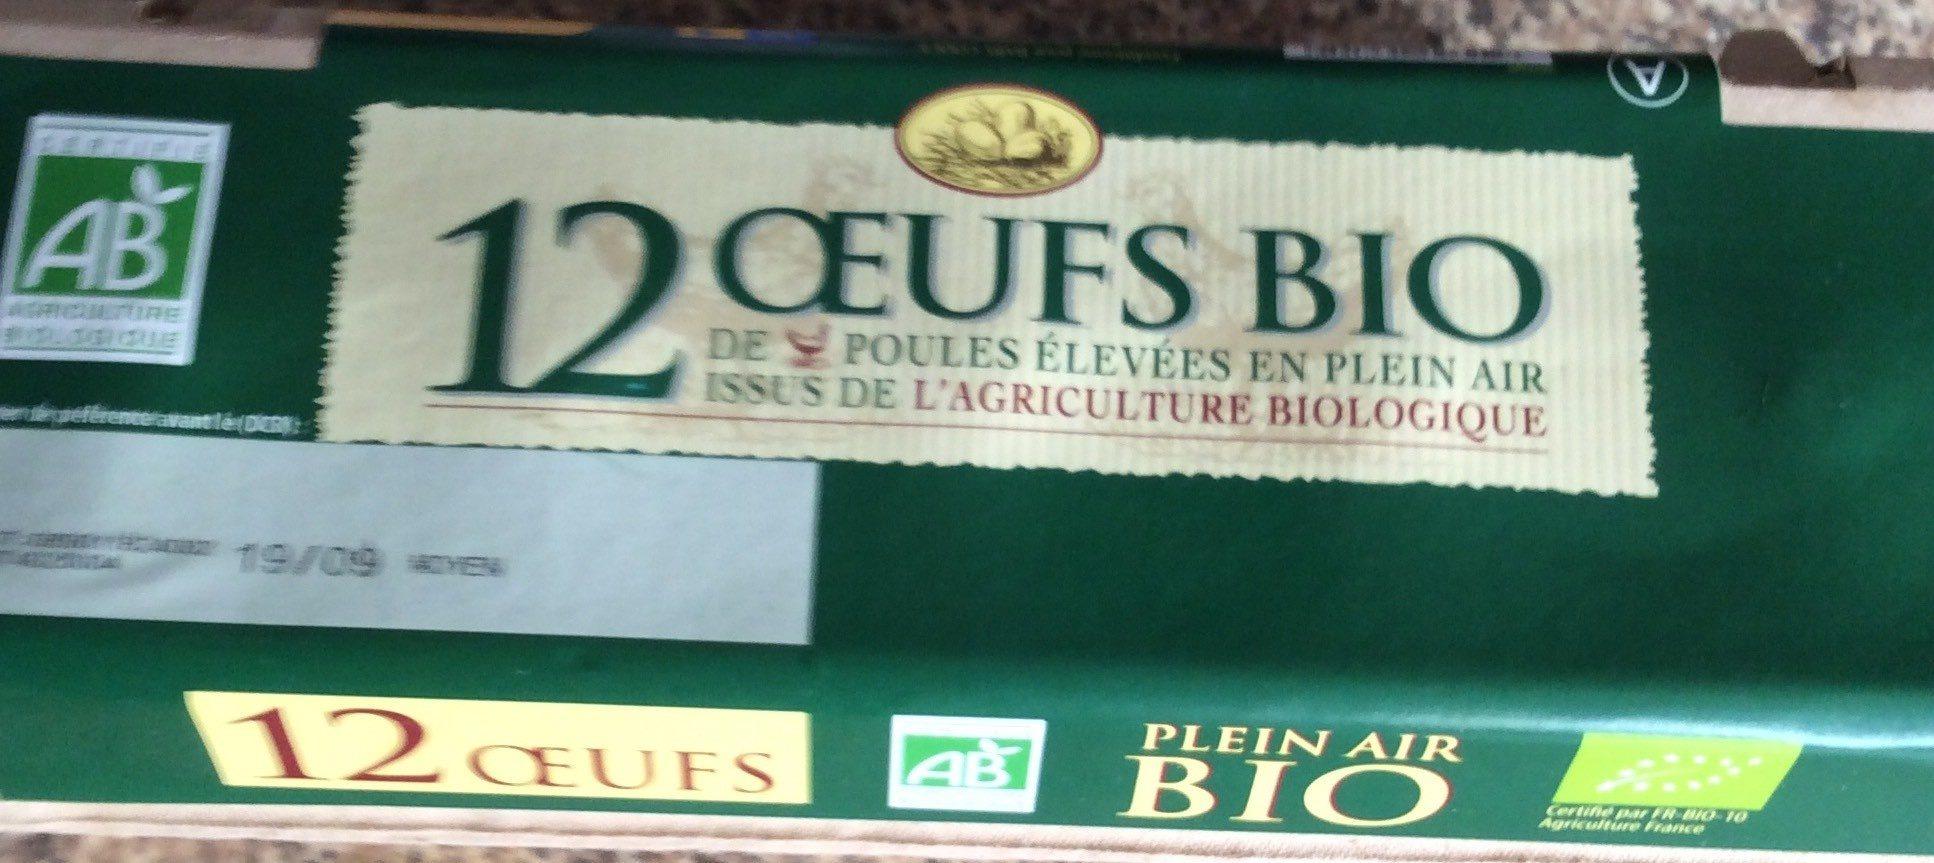 12 œufs BIO - Product